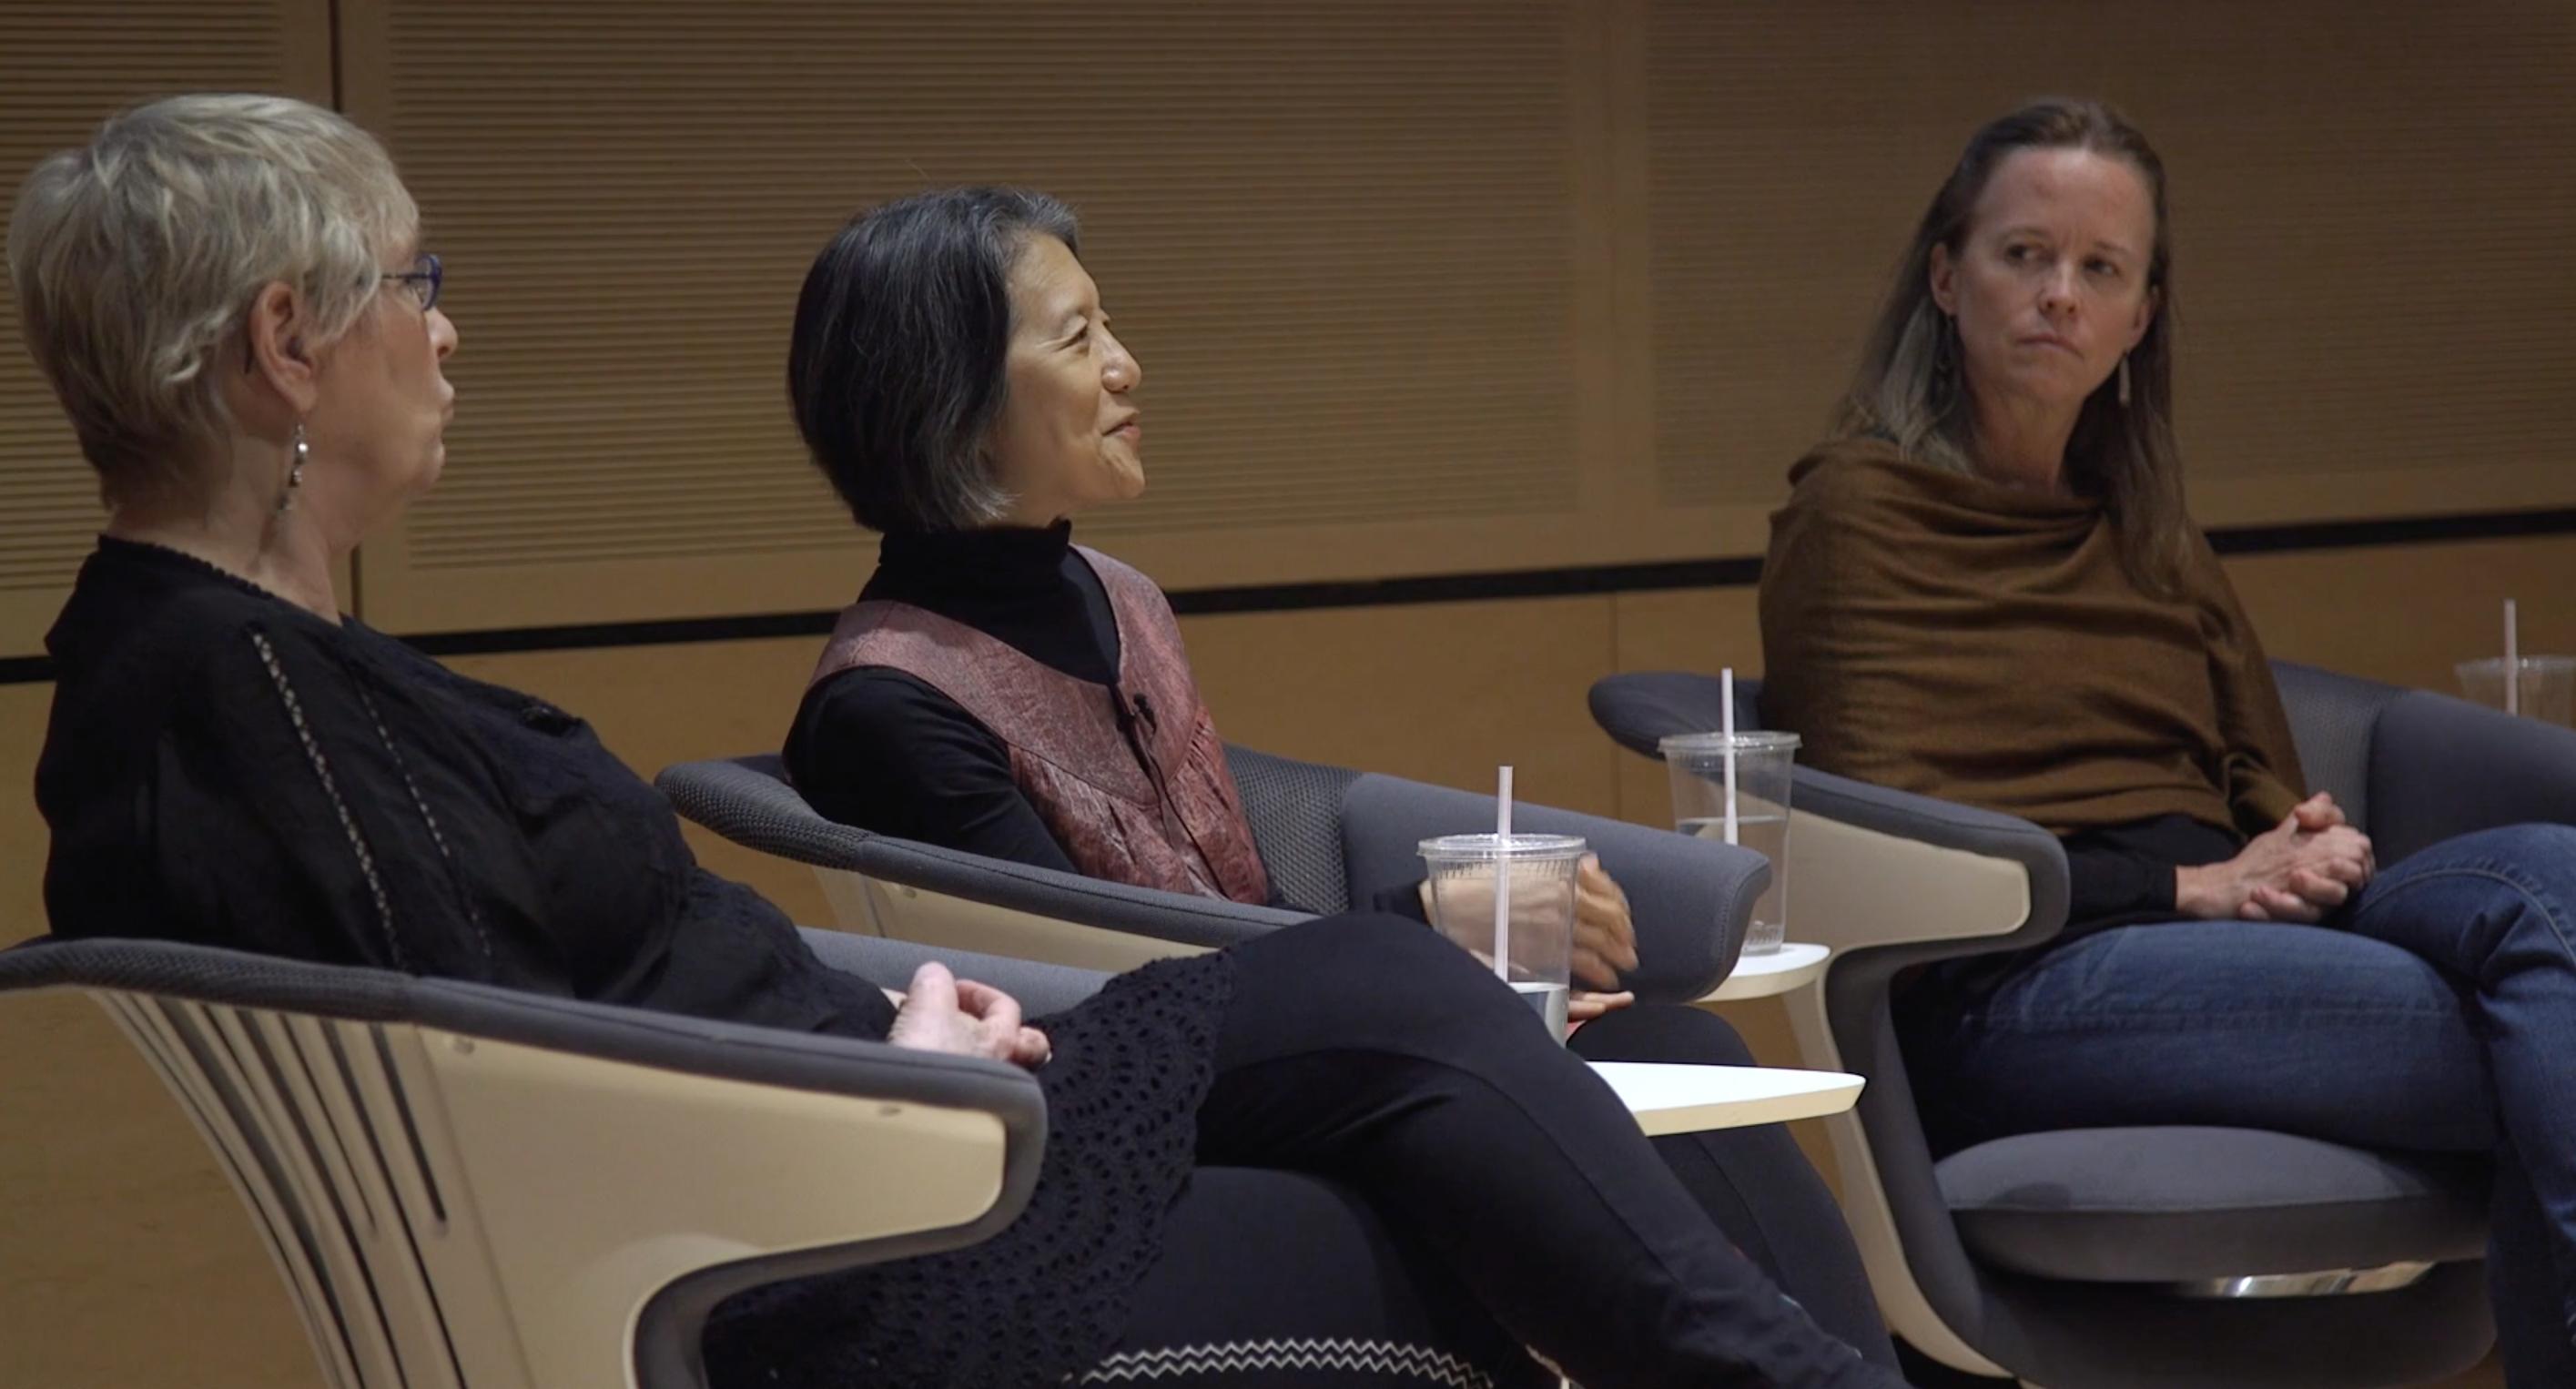 ladies speaking on a panel